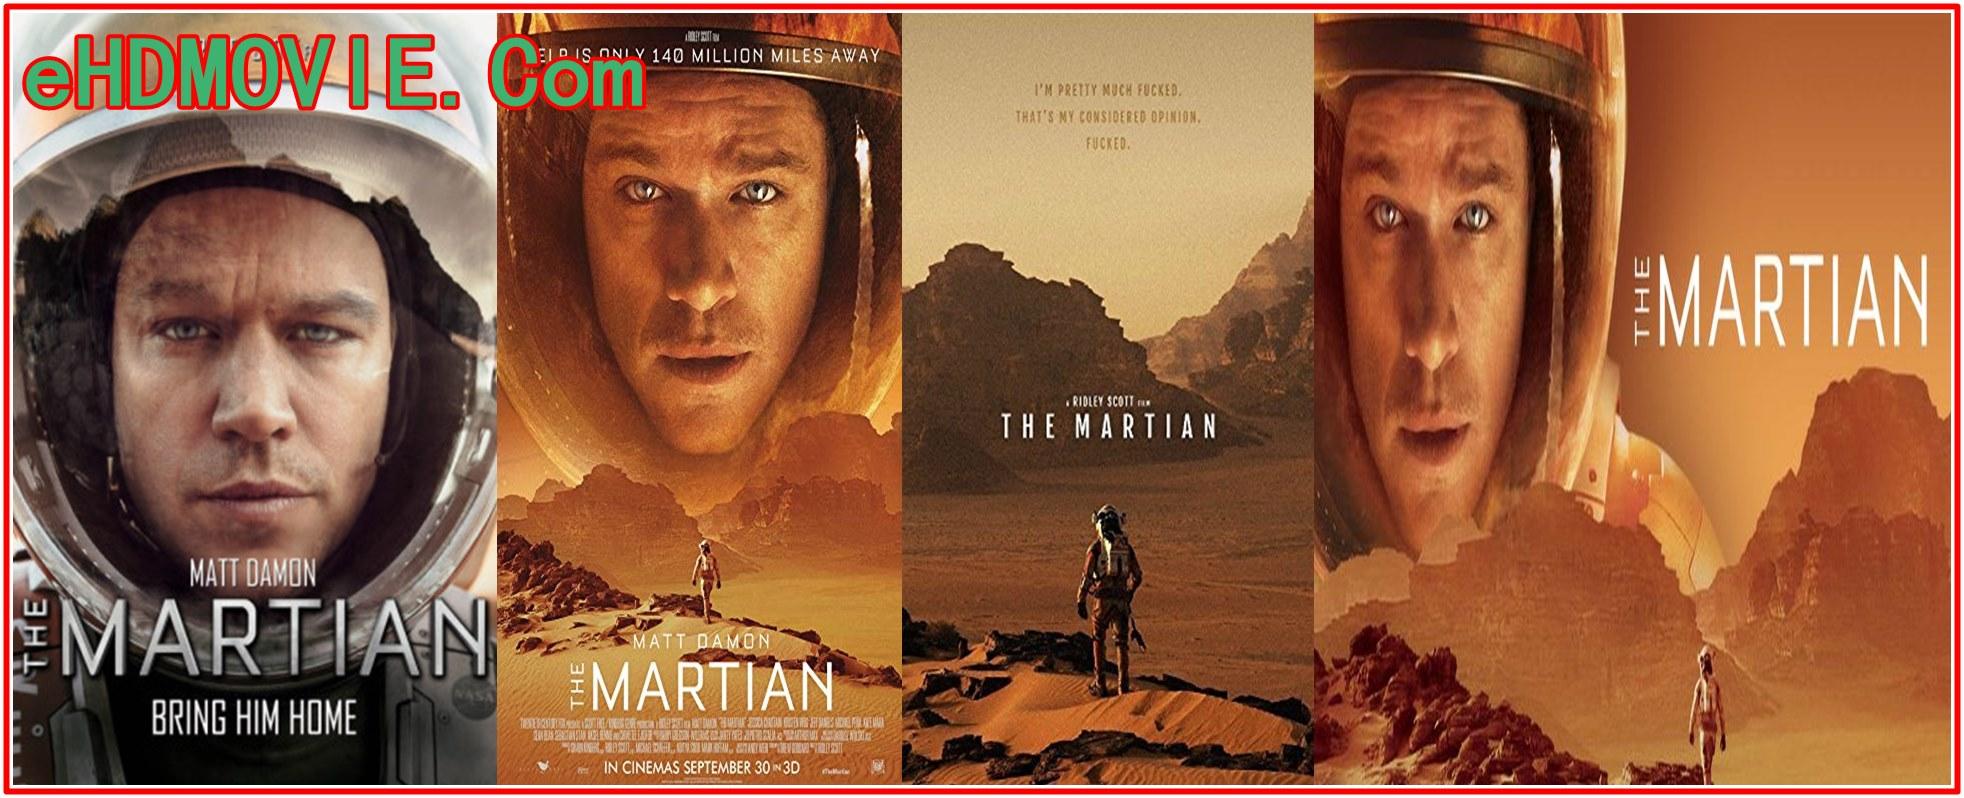 The Martian 2015 Full Movie Dual Audio [Hindi – English] 720p – 480p ORG BRRip 450MB – 1.2GB ESubs Free Download